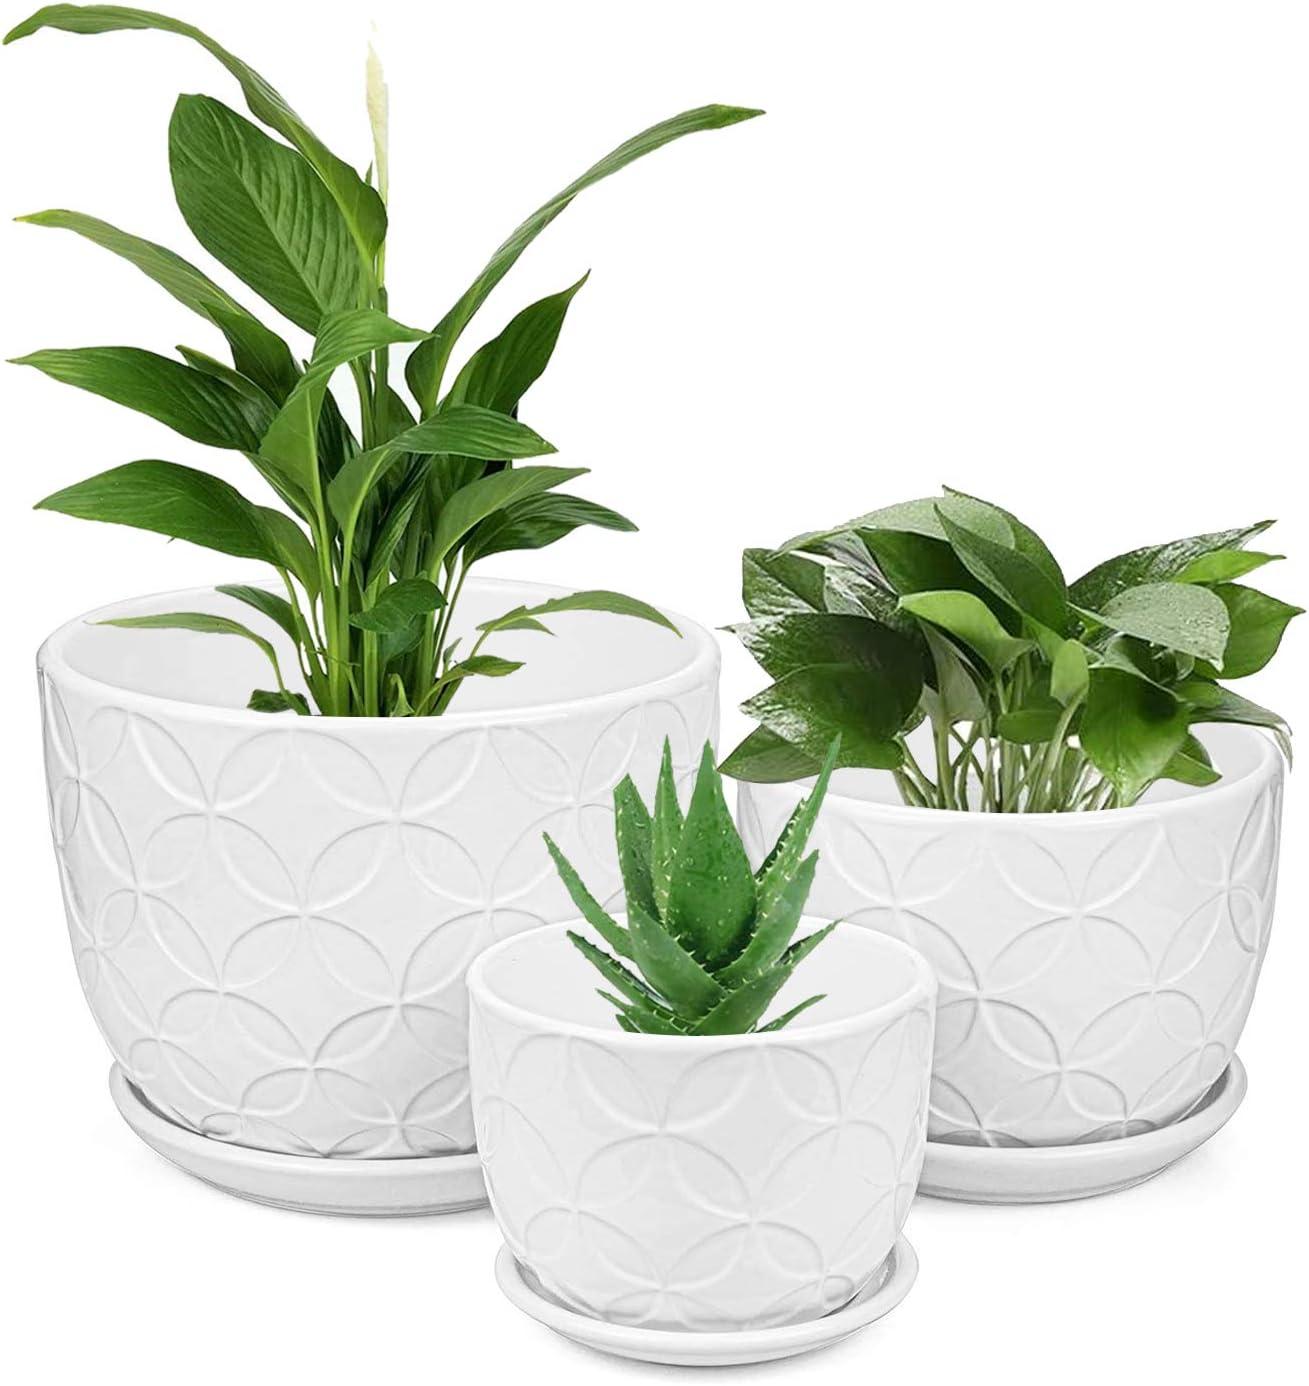 Plant Pots, Brajttt Flower Pots Planters Set of 3,Modern Decorative Succulent Pot Gardening Pot with Drainage Hole for Indoor Plants Flowers Herbs